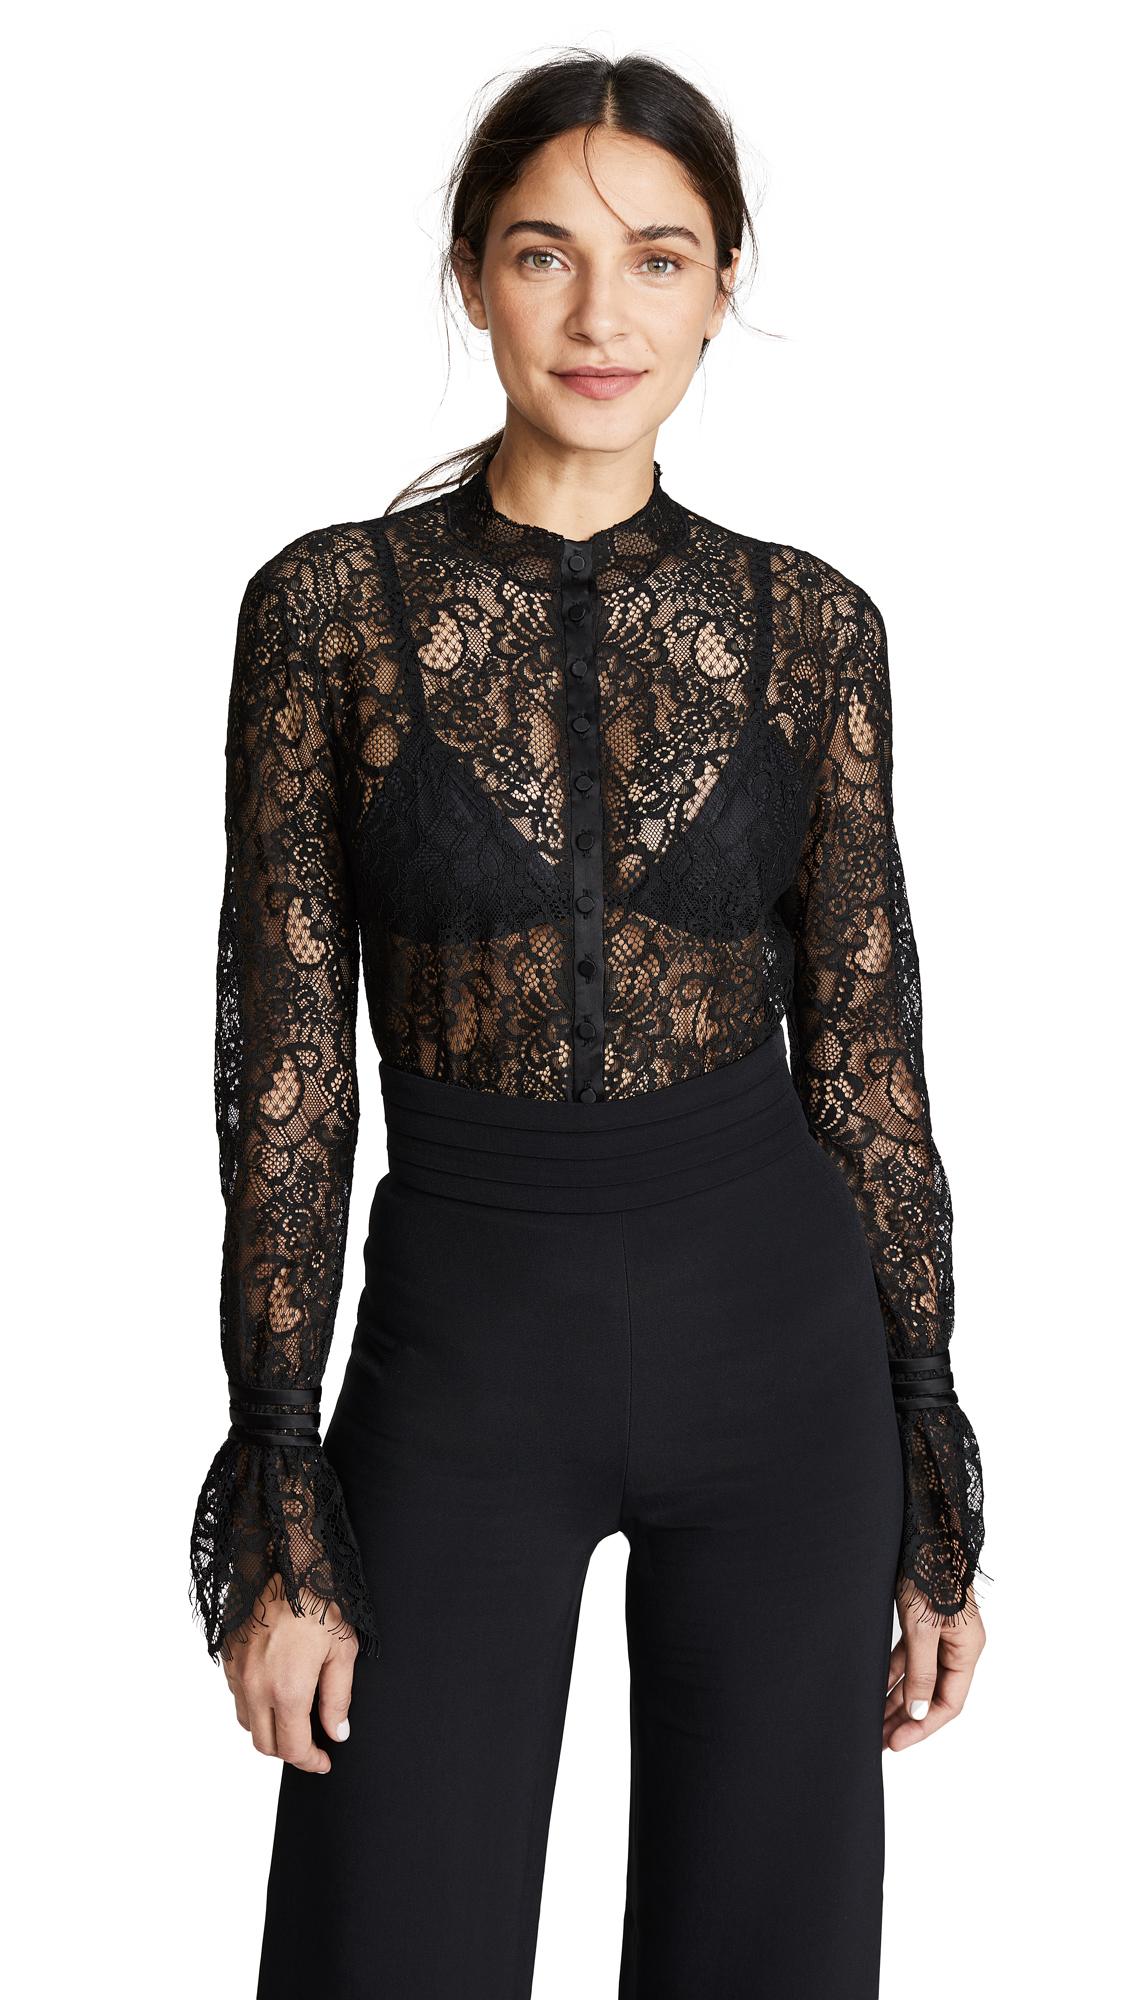 Jonathan Simkhai Mixed Lace Rouched Sleeve Bodysuit In Black